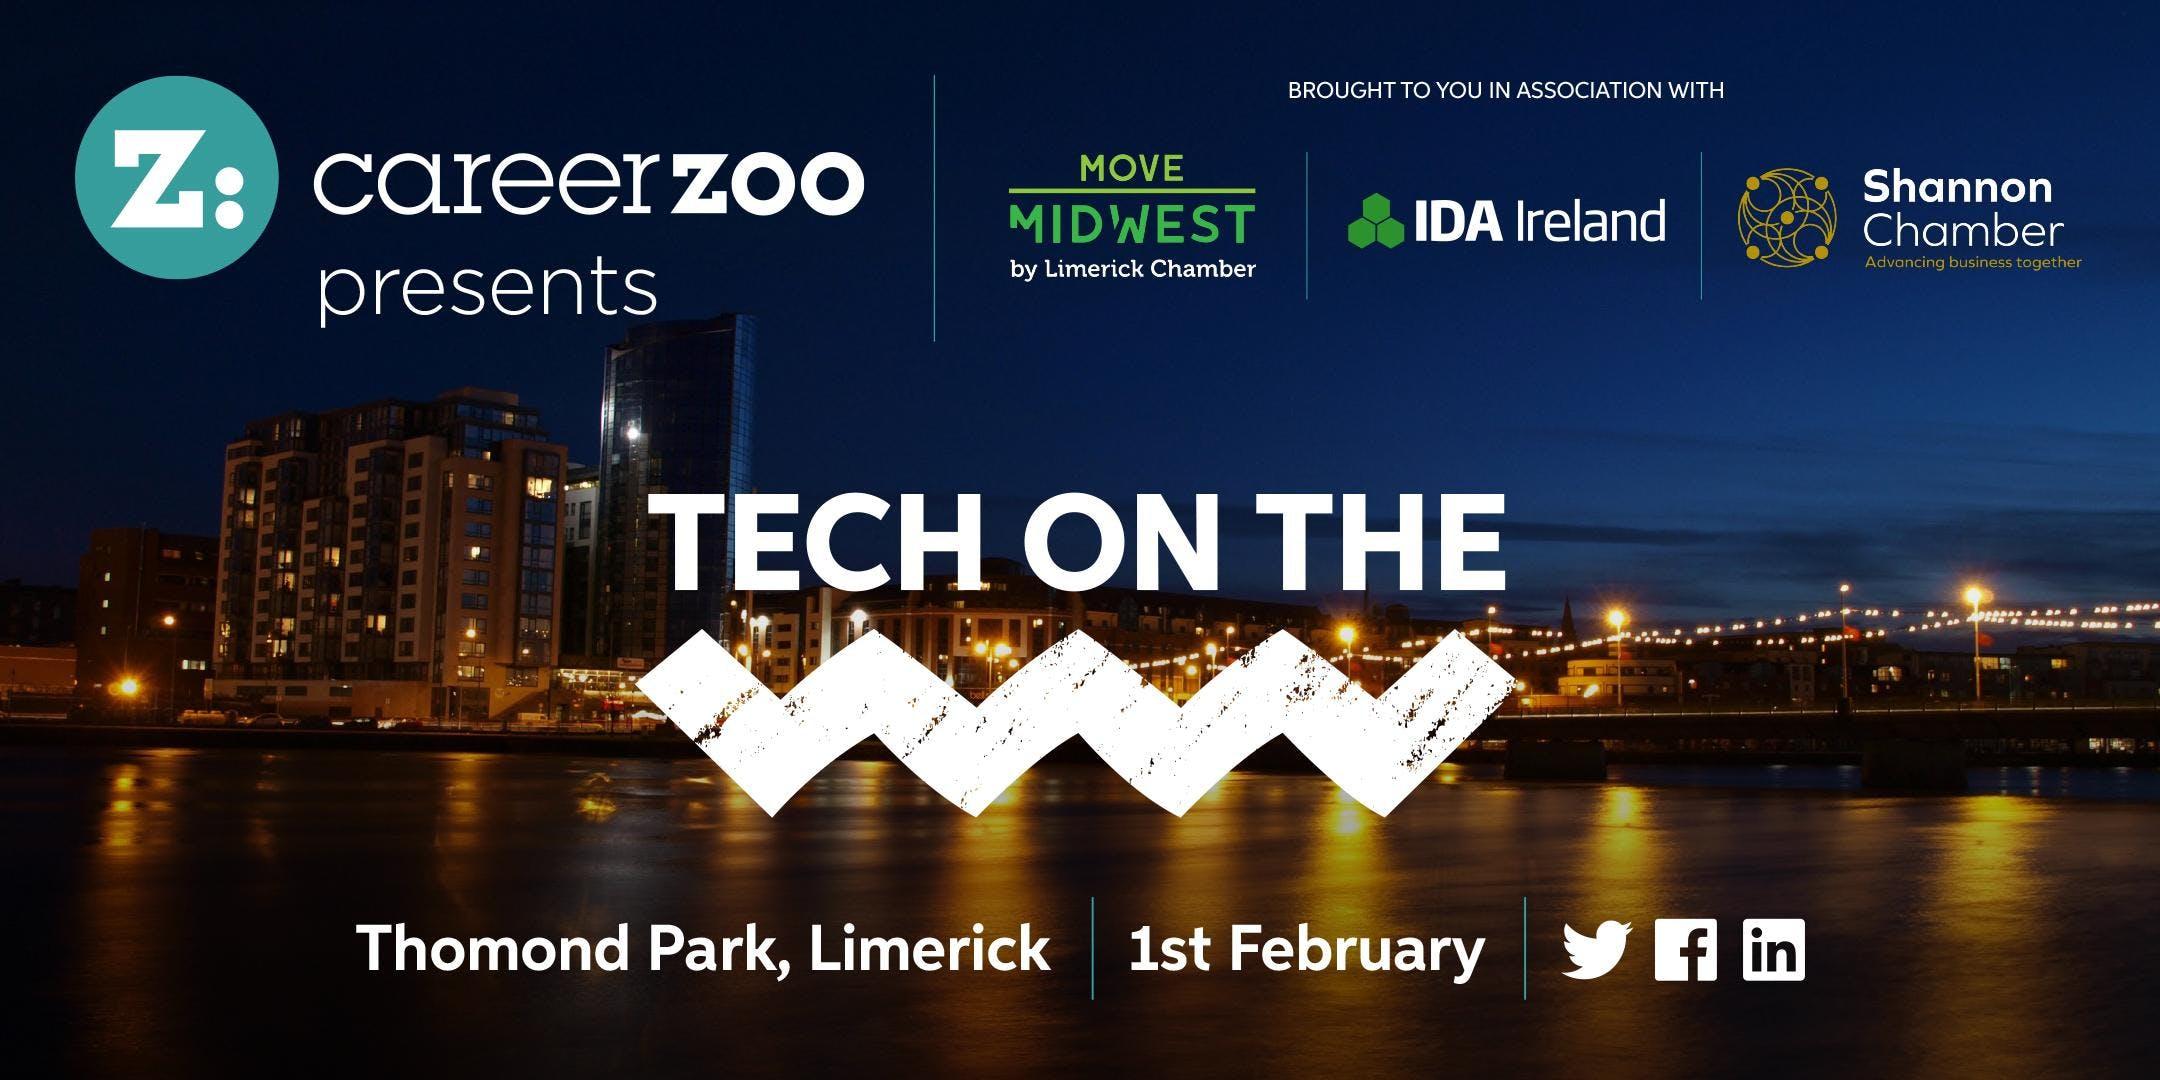 Career Zoo presents: Tech on the Wild Atlantic Way 2020